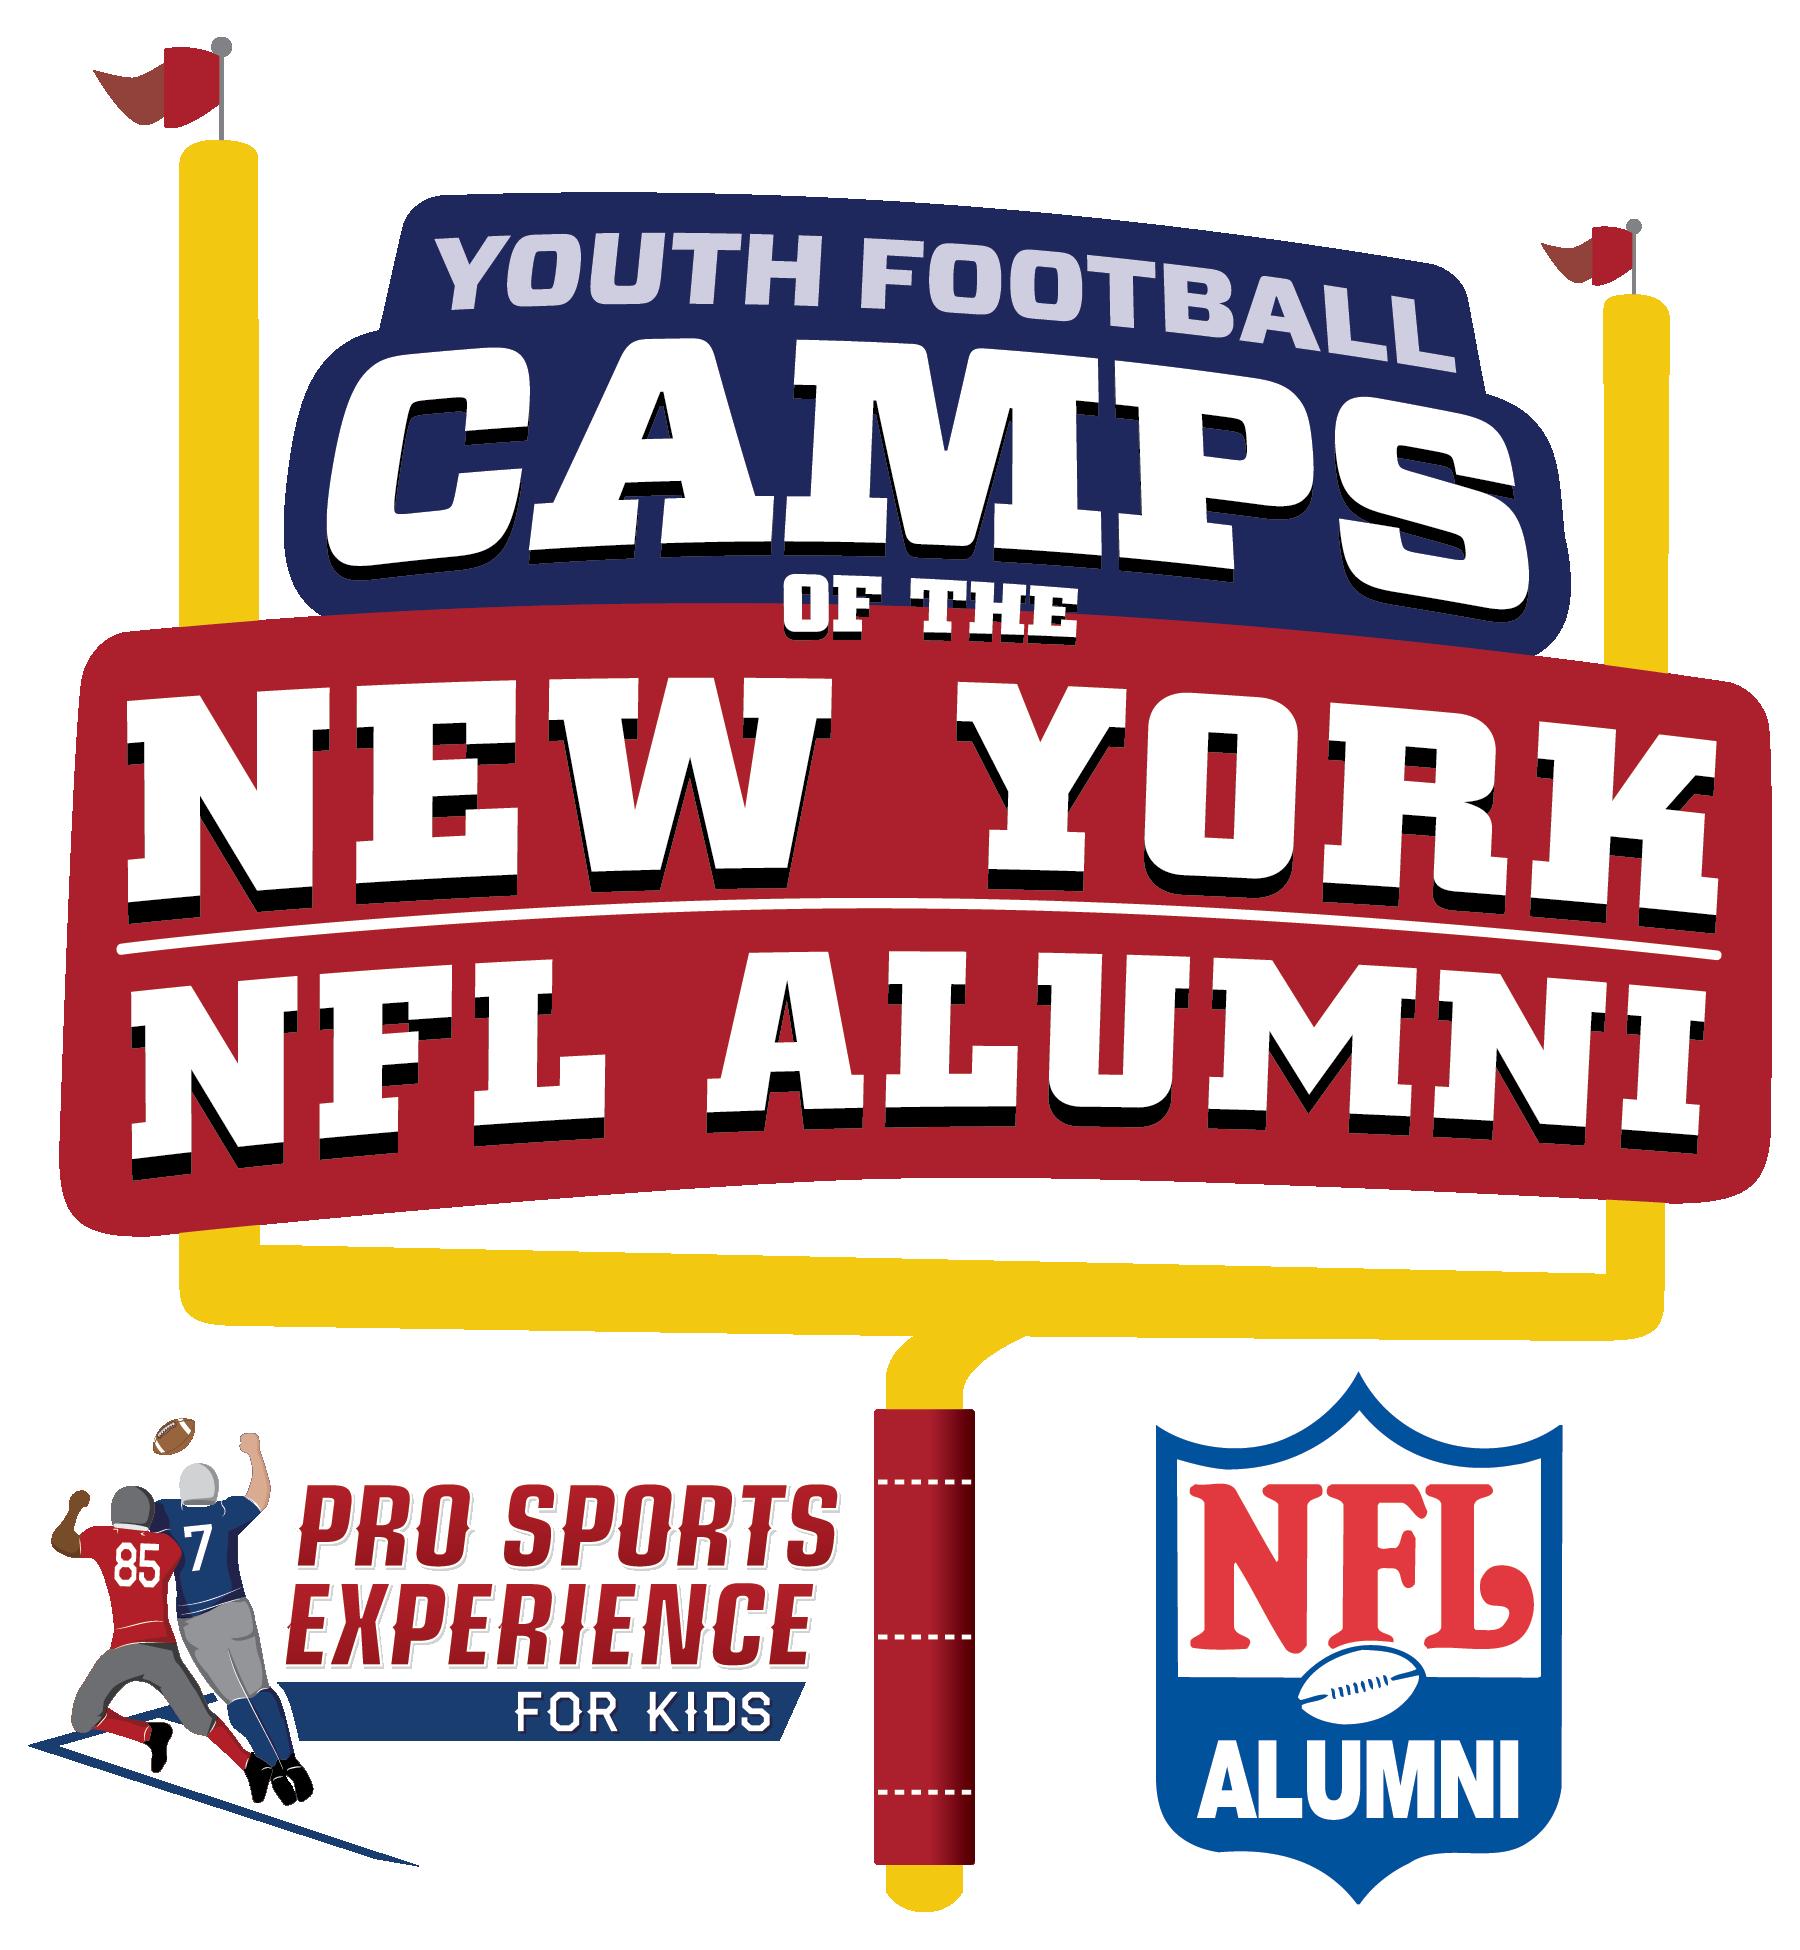 New York NFL Alumni Hero Youth Football Camps - Summit